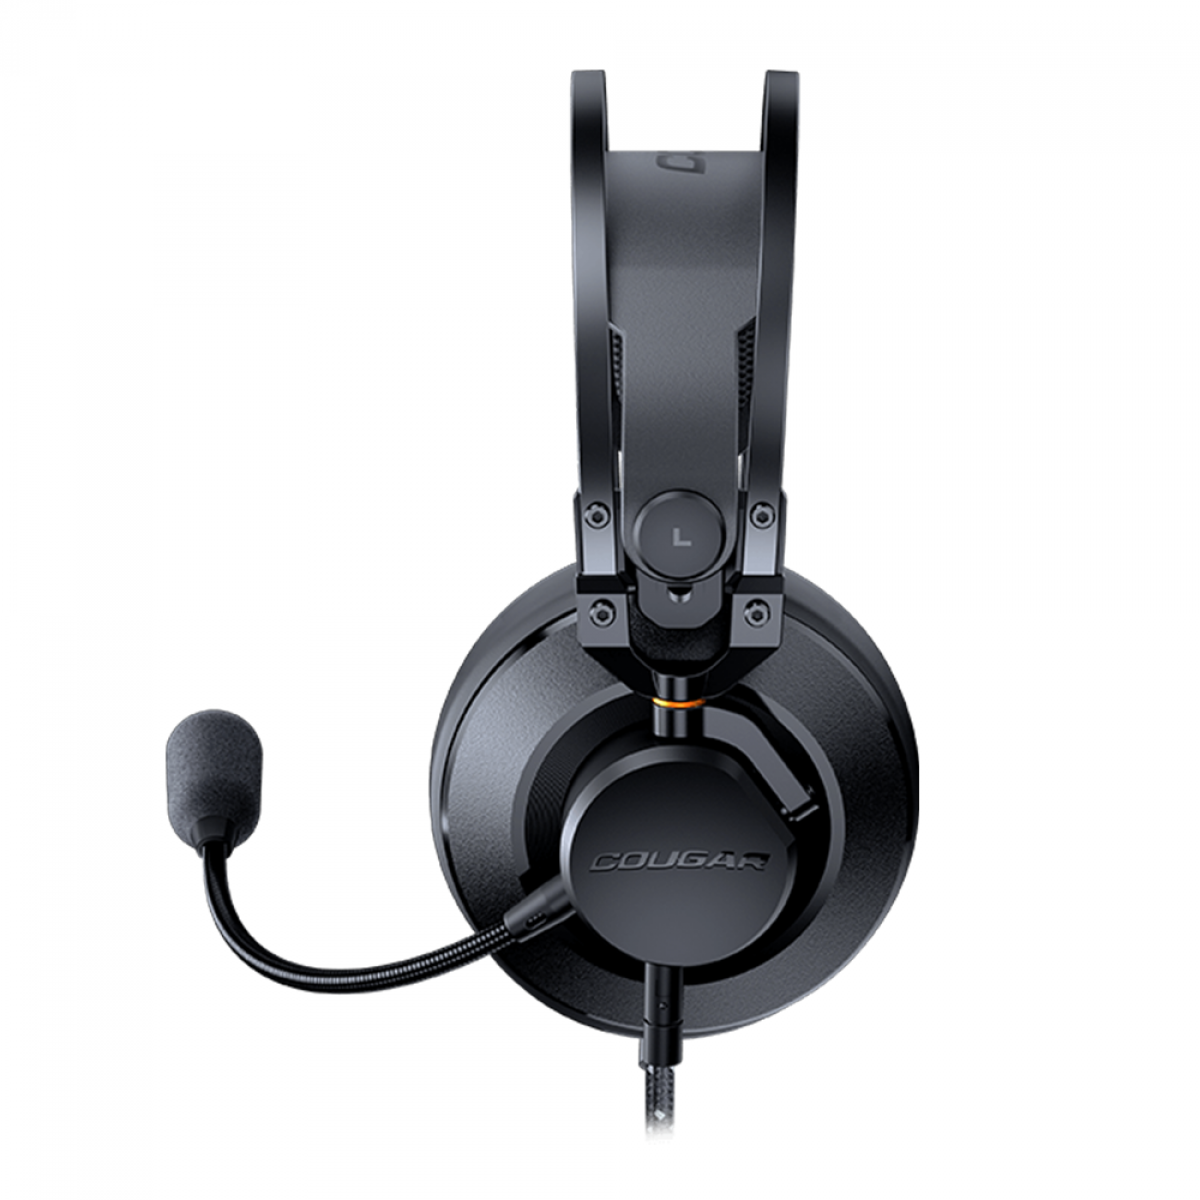 Headset Gamer Cougar VM410, 3.5mm, Multi Plataforma, Black, 3H550P53B.0001